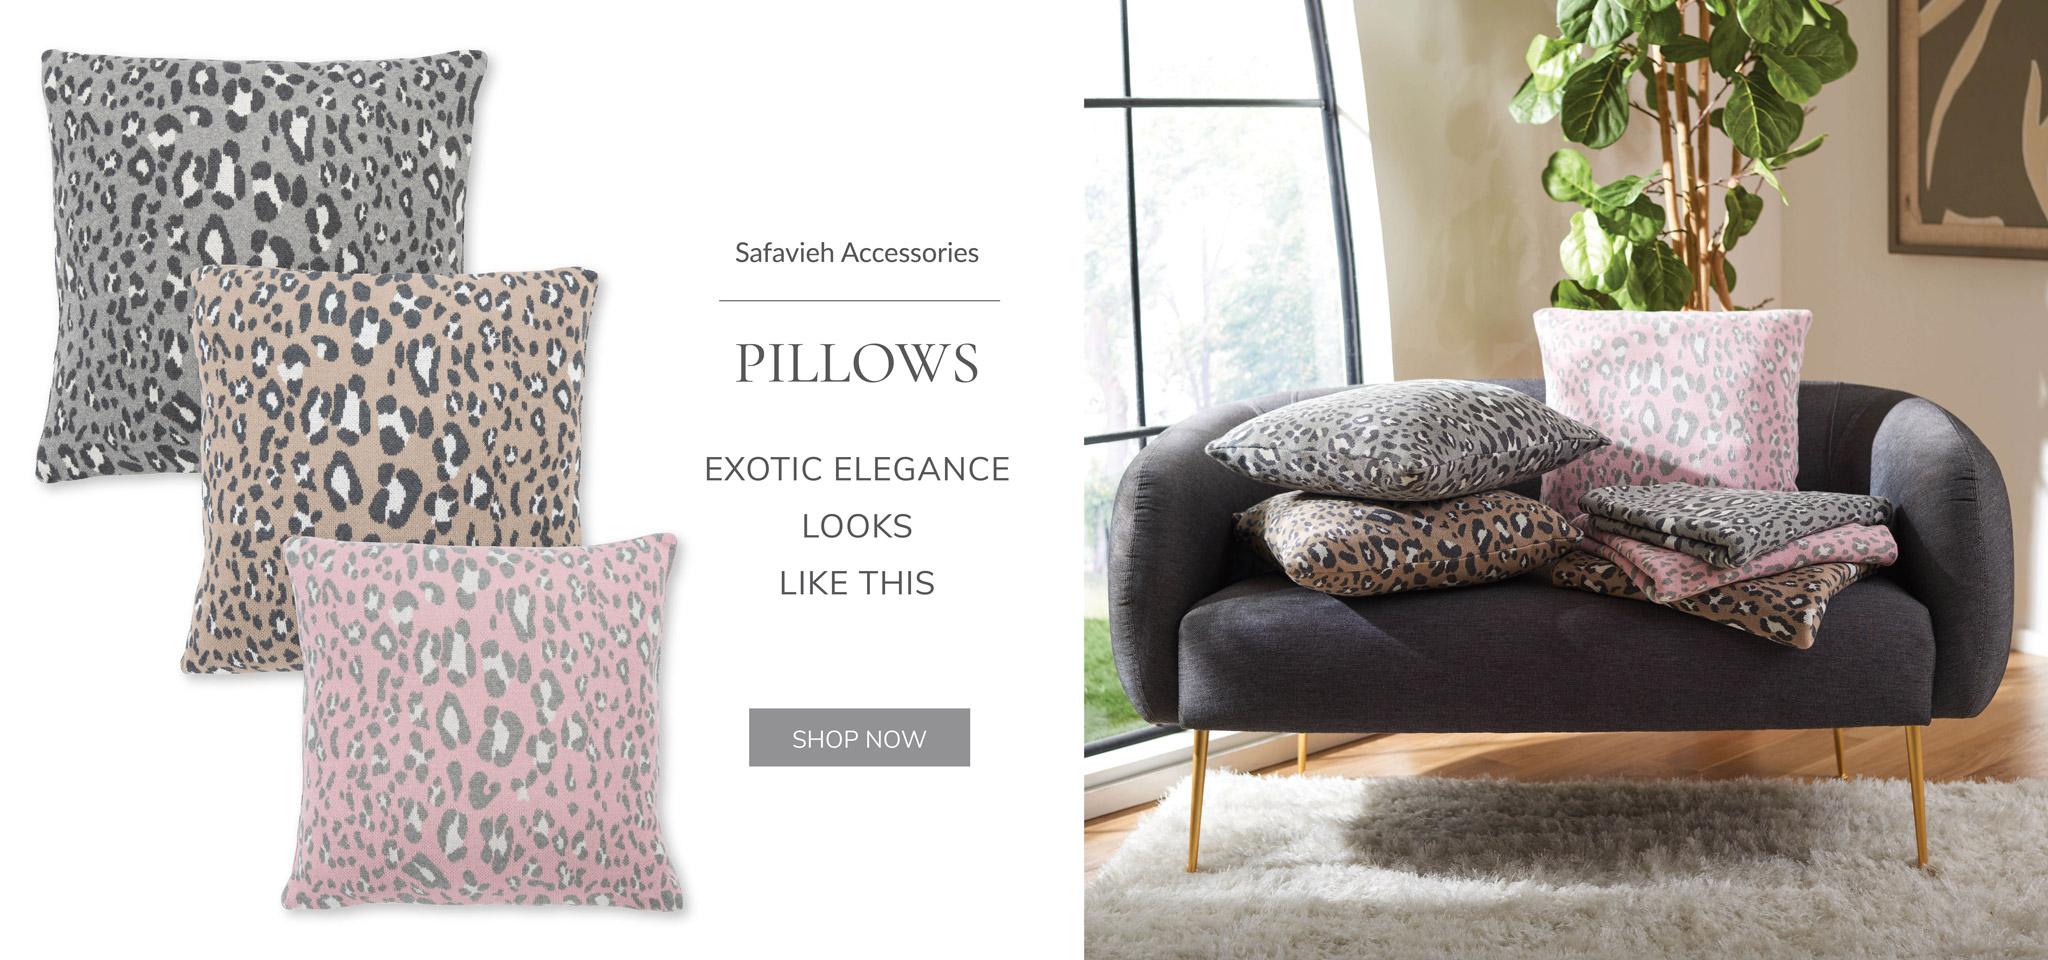 Safavieh Accessories - Pillows